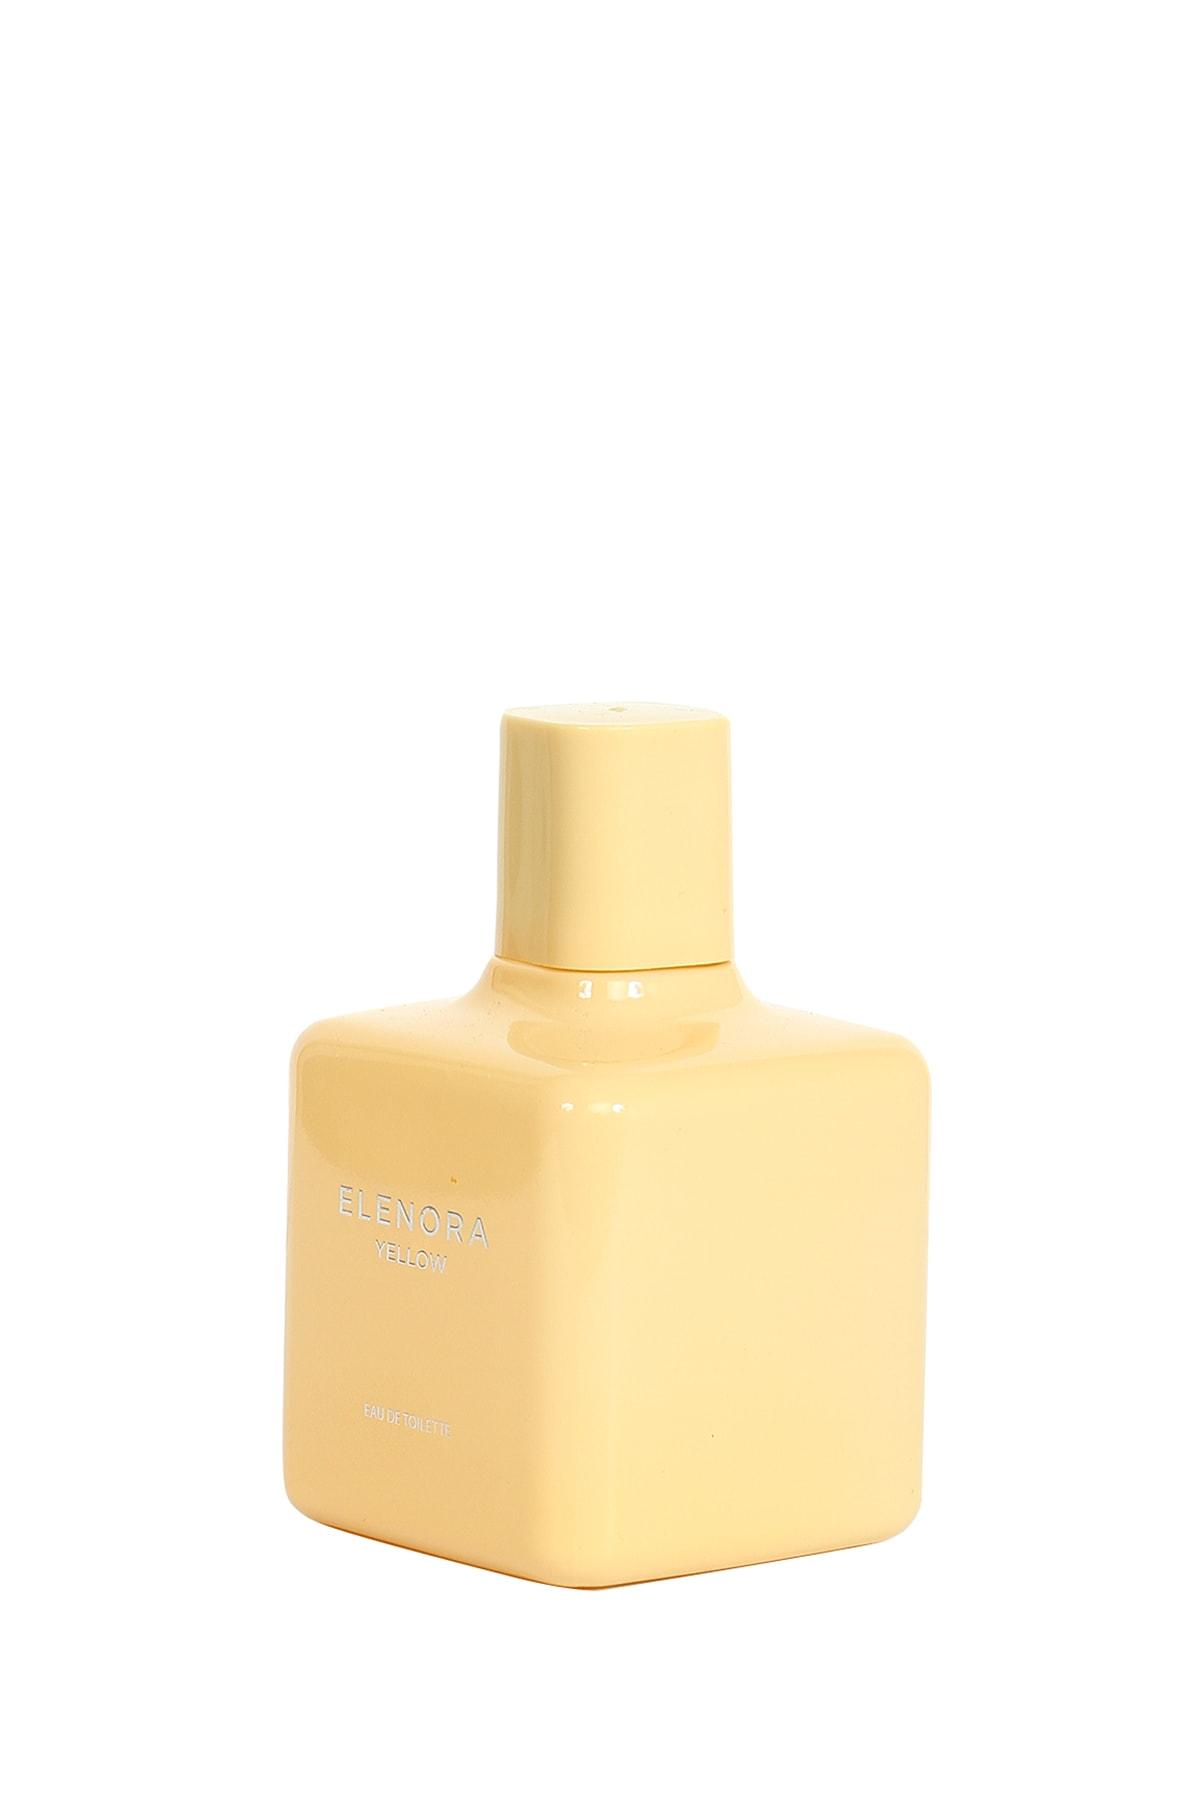 Collezione Kadın Sarı Parfüm Elenora UCB280269A39 2